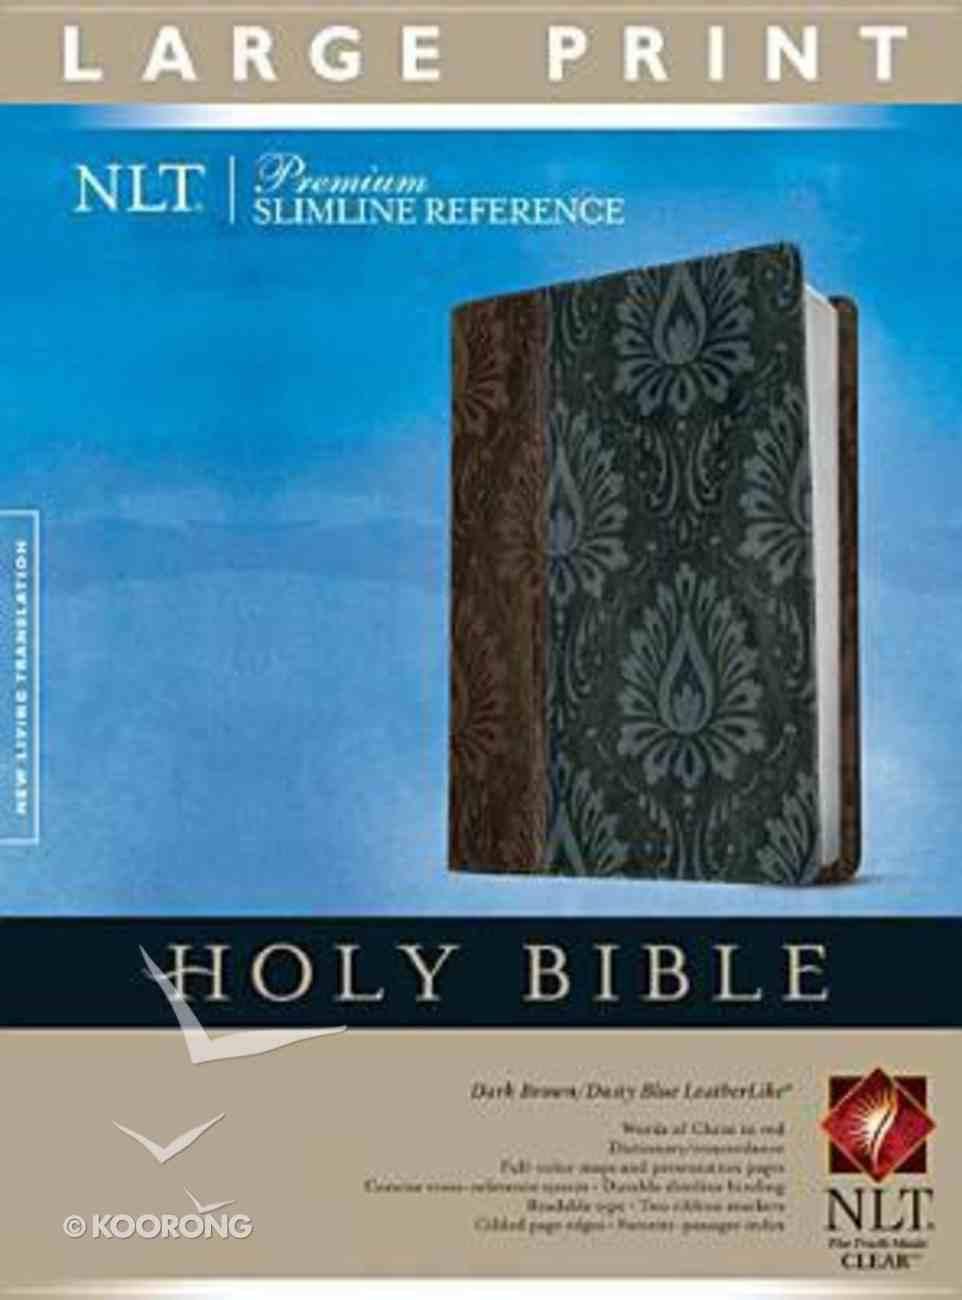 NLT Premium Slimline Reference Bible Large Print Dark Brown/Dusty Blue (Red Letter Edition) Imitation Leather